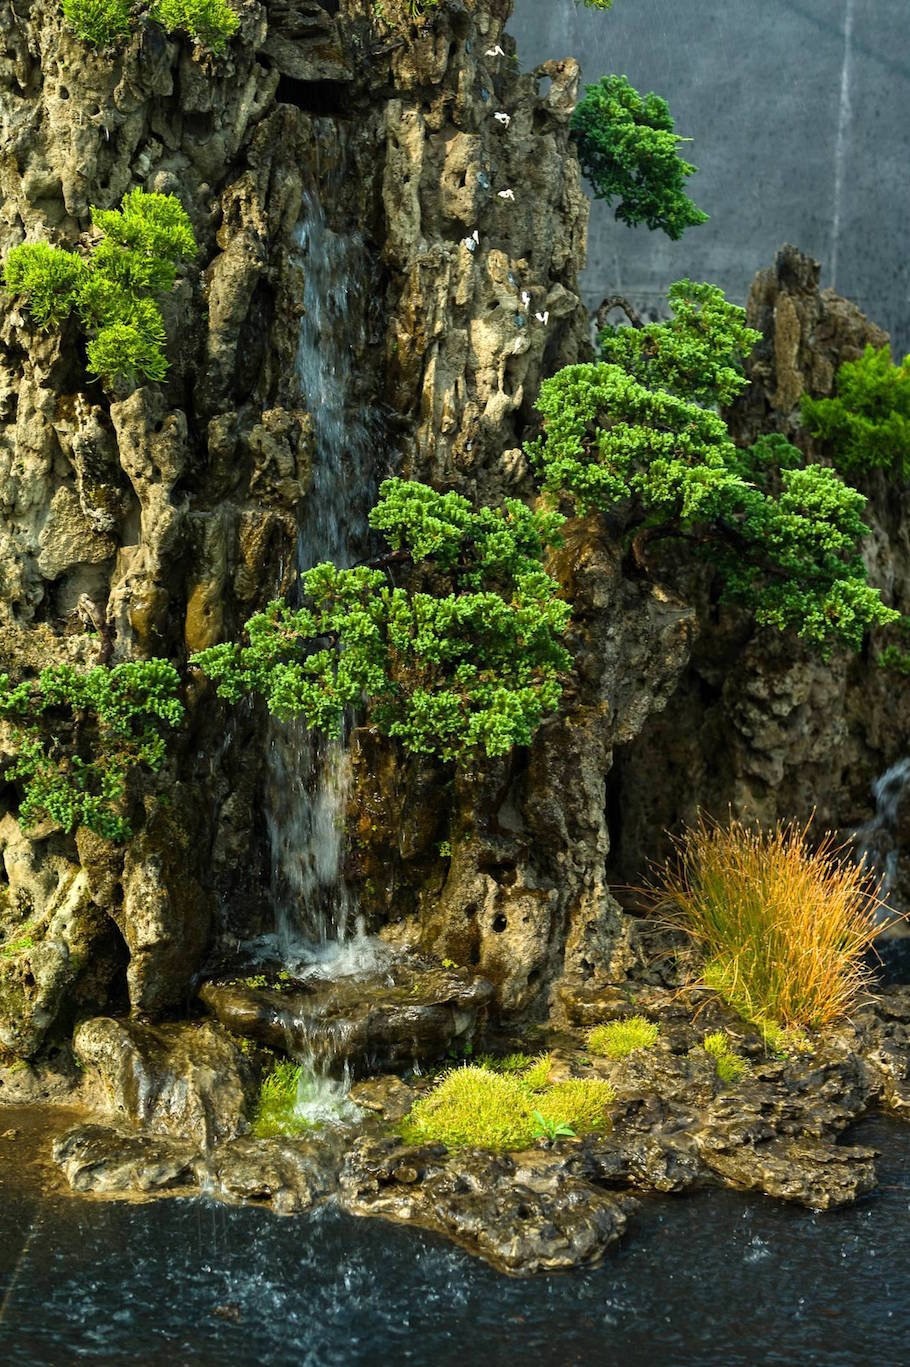 The Bonsai landscape - Bonsai Empire